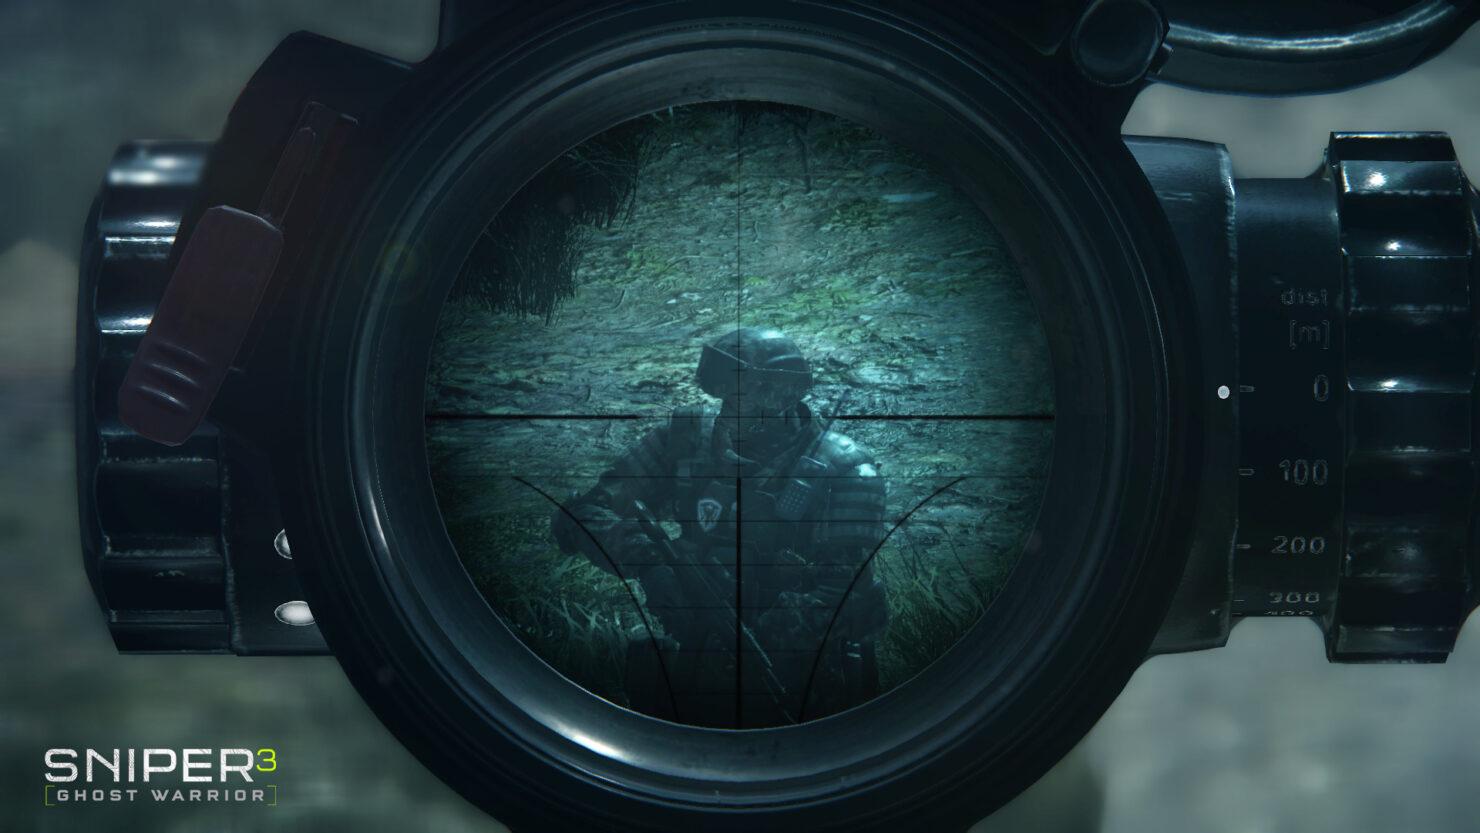 sniping_screenshot_sgw3